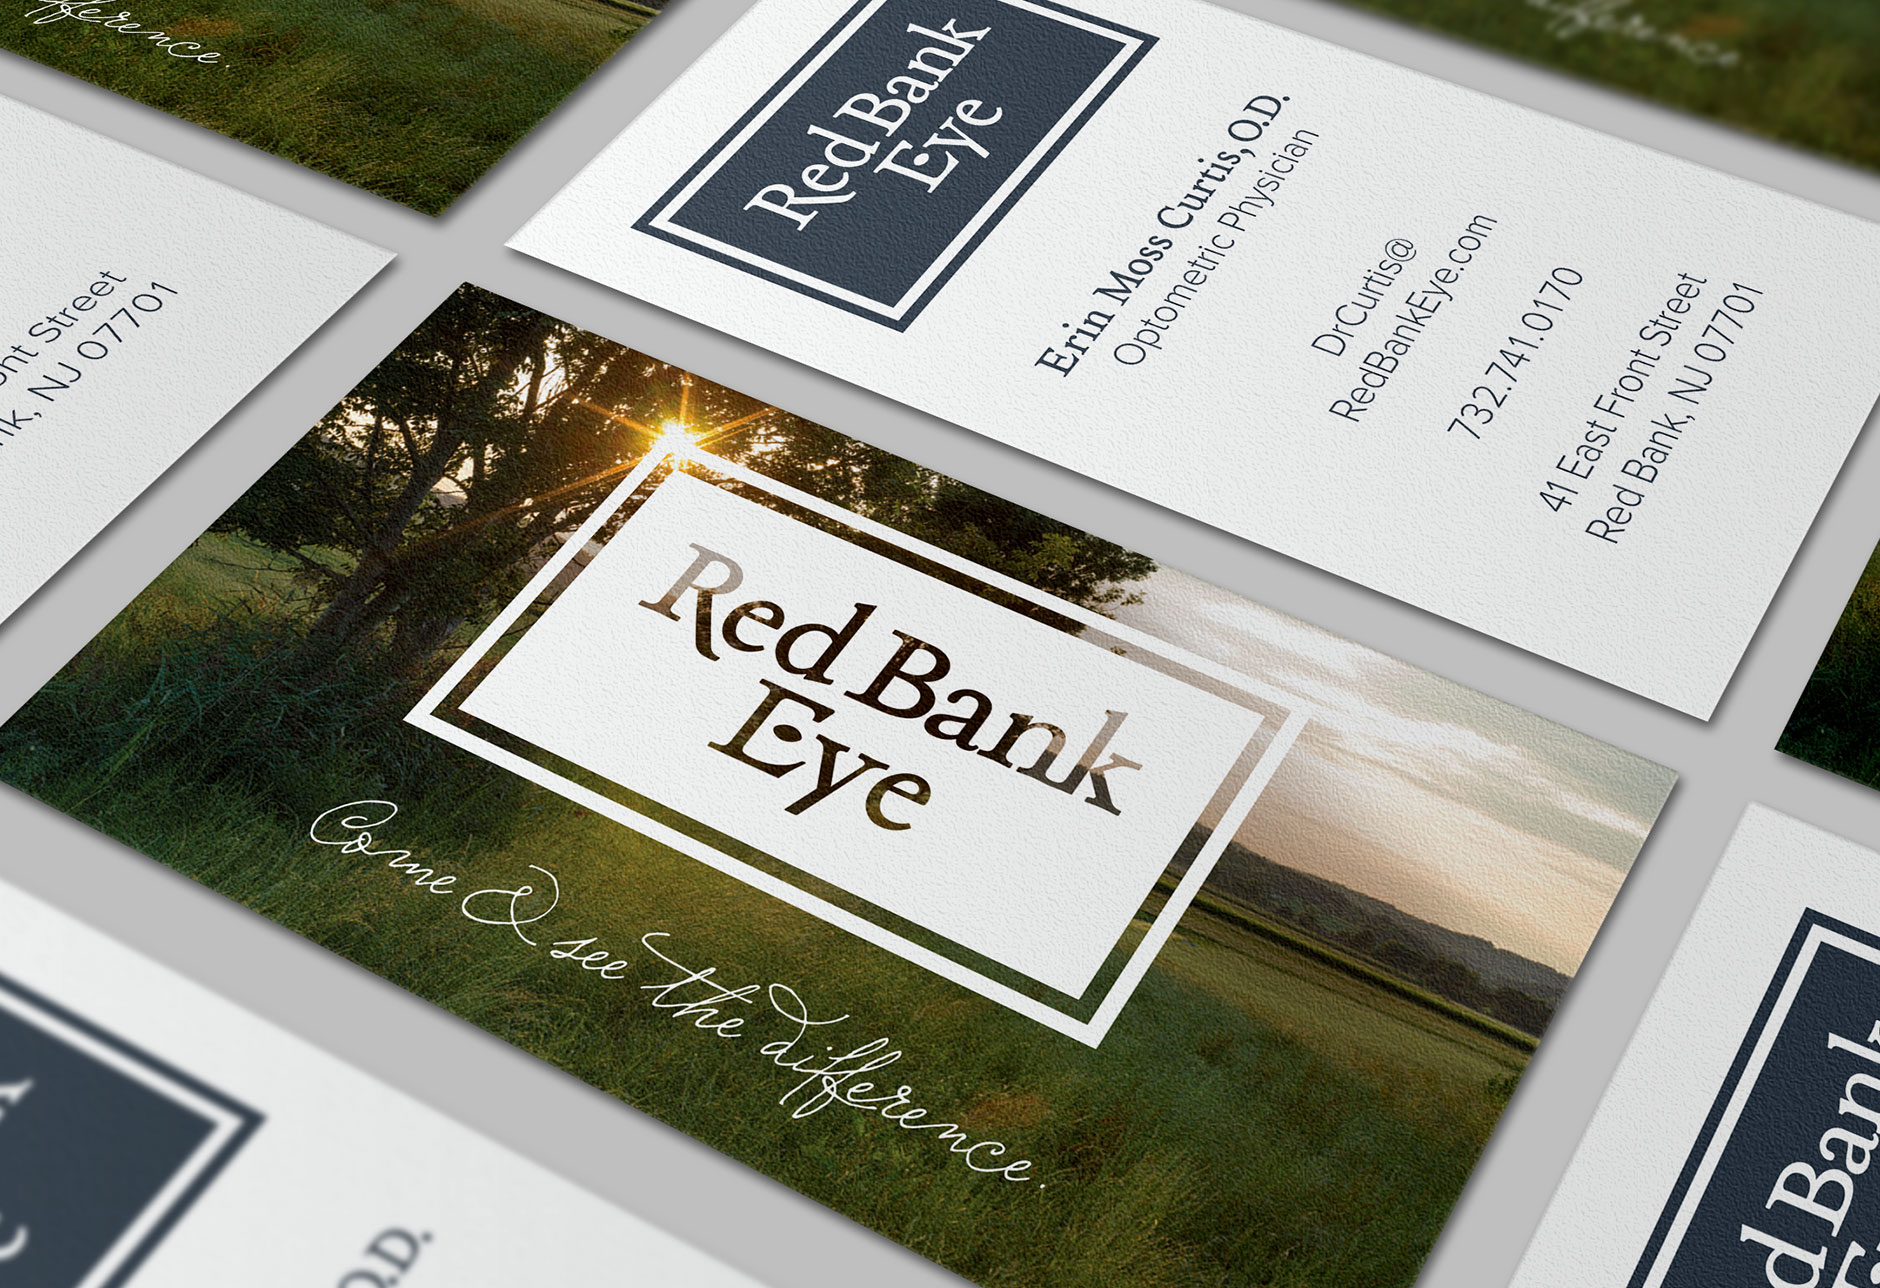 Red Bank eye doctor, Rebrand, Business Card